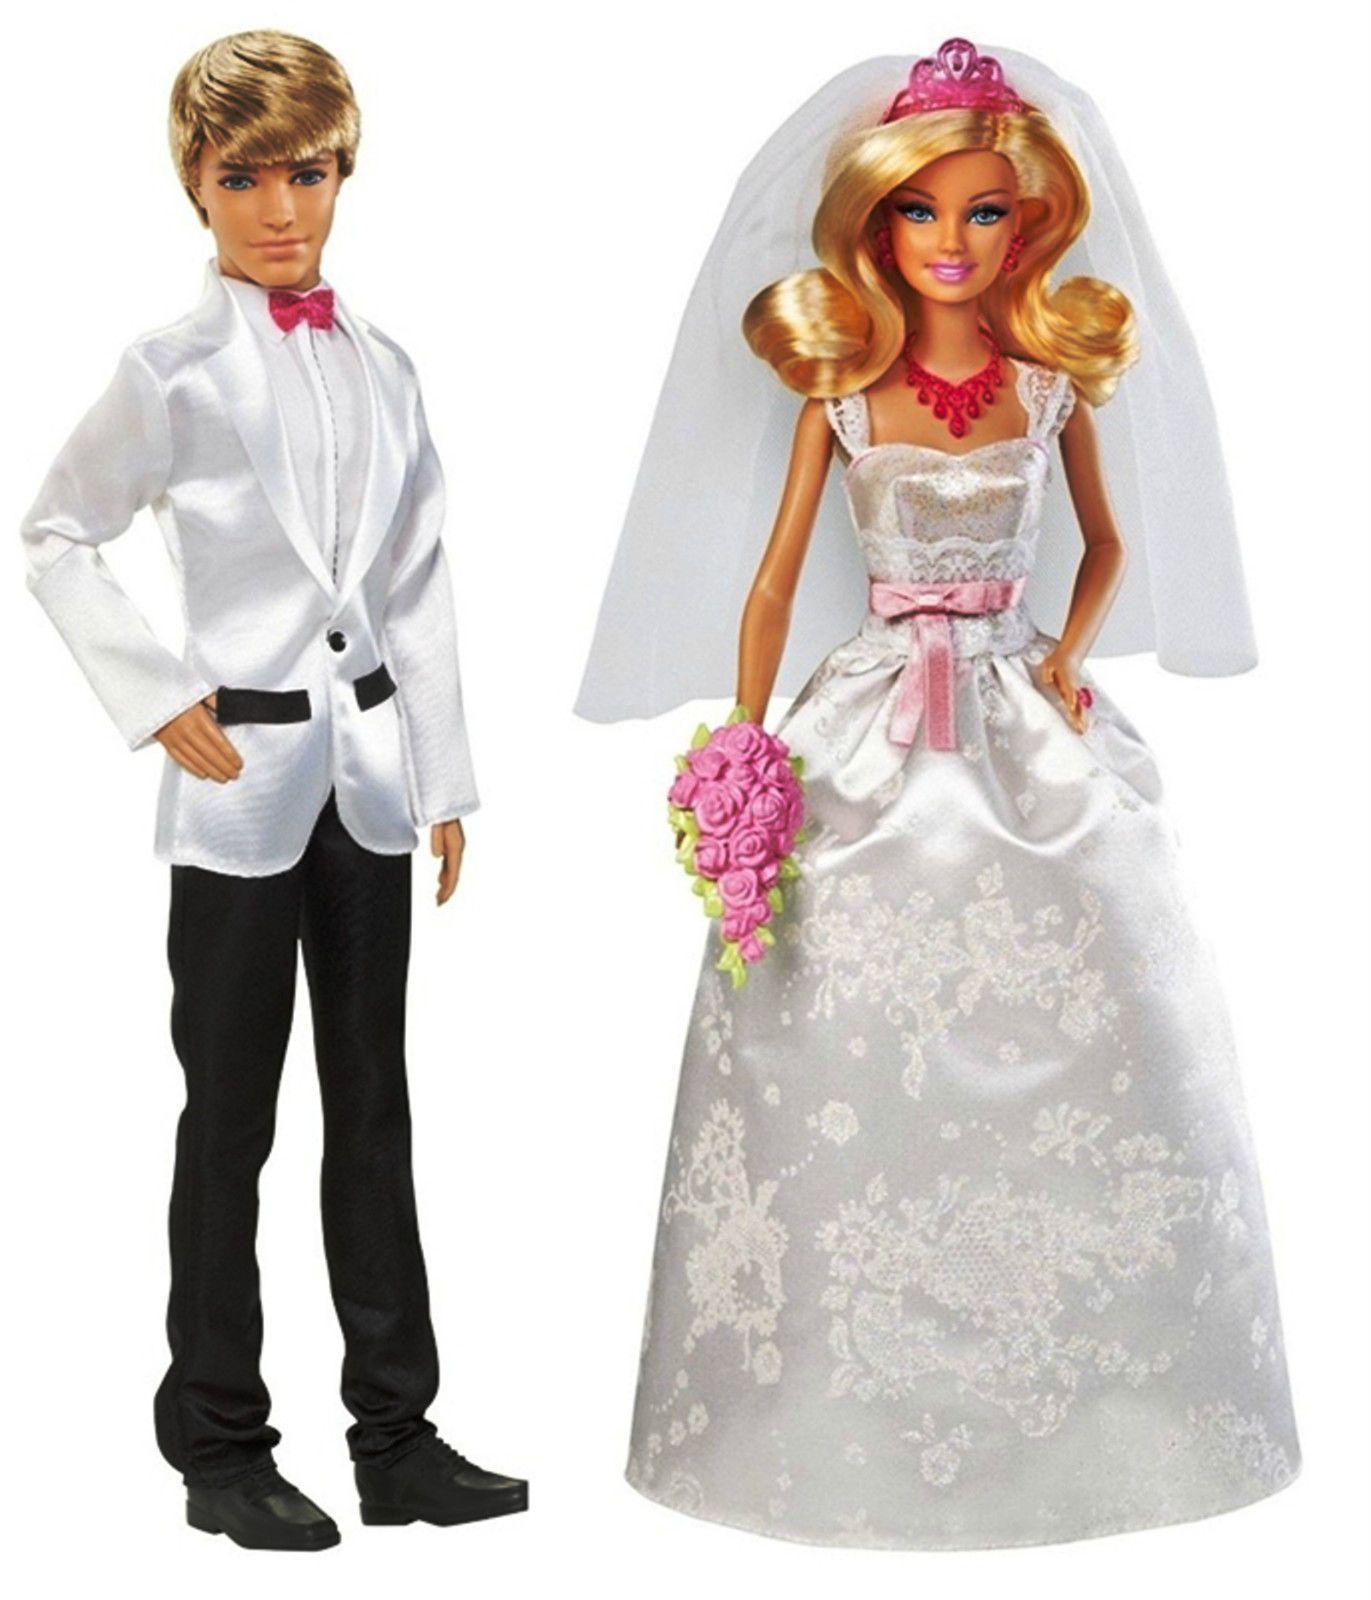 "Mattel X9444 + W2864 Barbie ""Brautpaar Barbie + Ken "" 2 Puppen- Braut+Bräutigam   eBay"